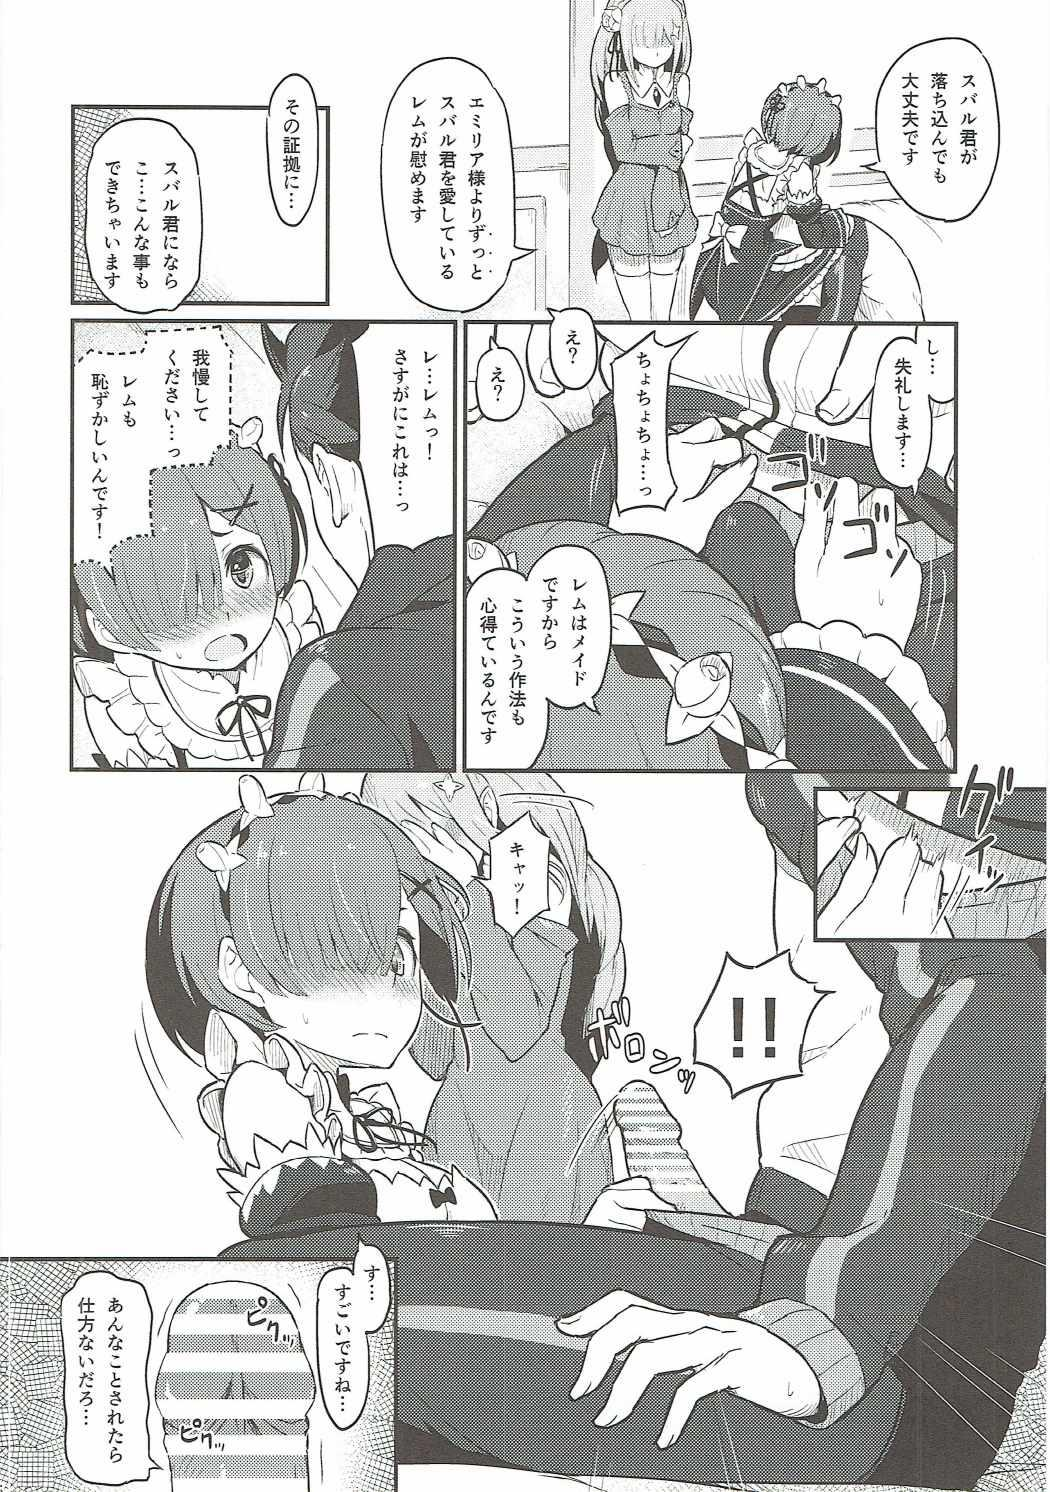 Rem no Emilia Kuttsuke Daisakusen 6